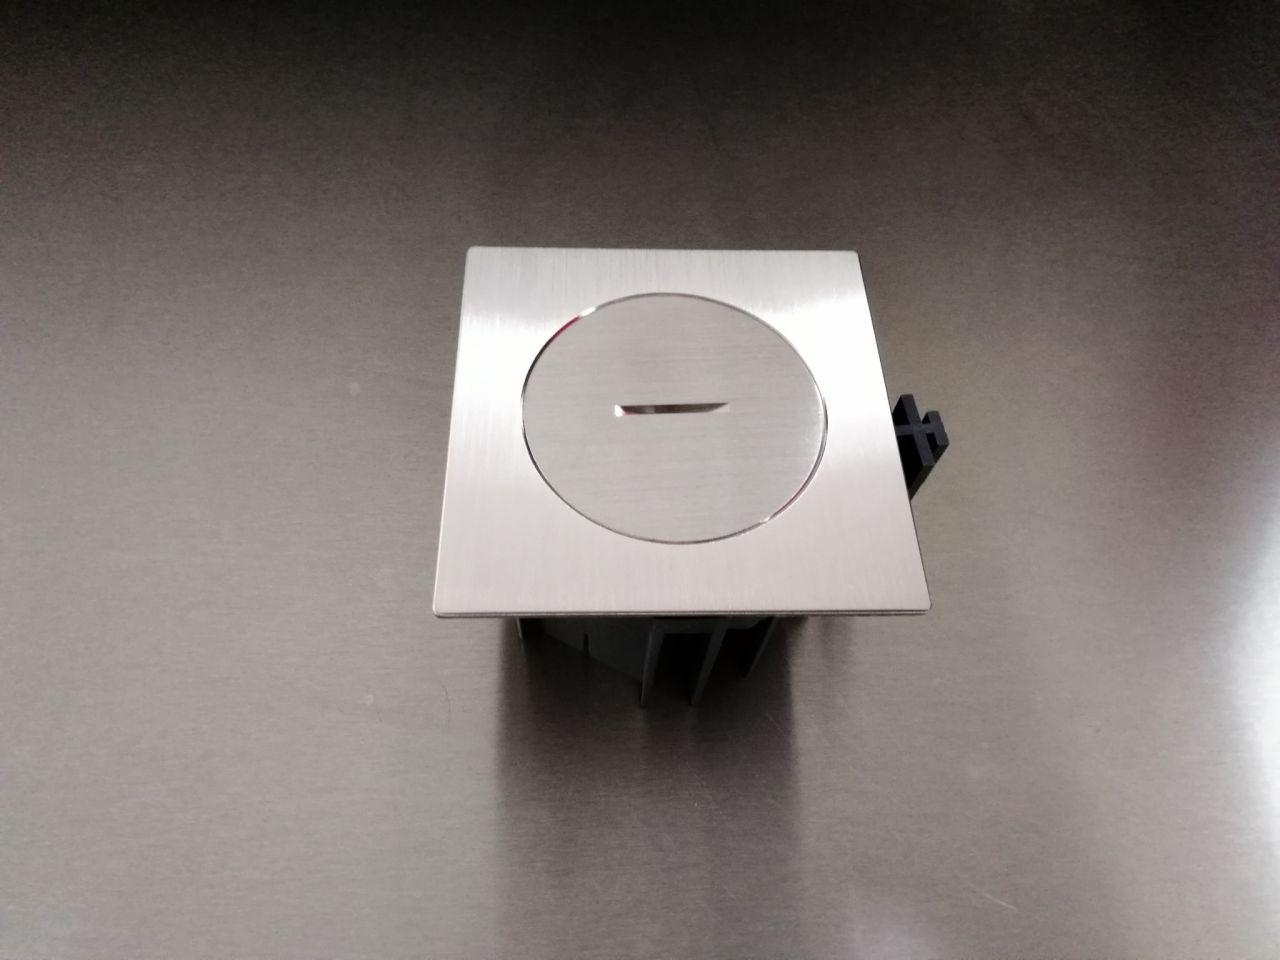 Prise de sol, modèle ARPI Floor socket IP-66